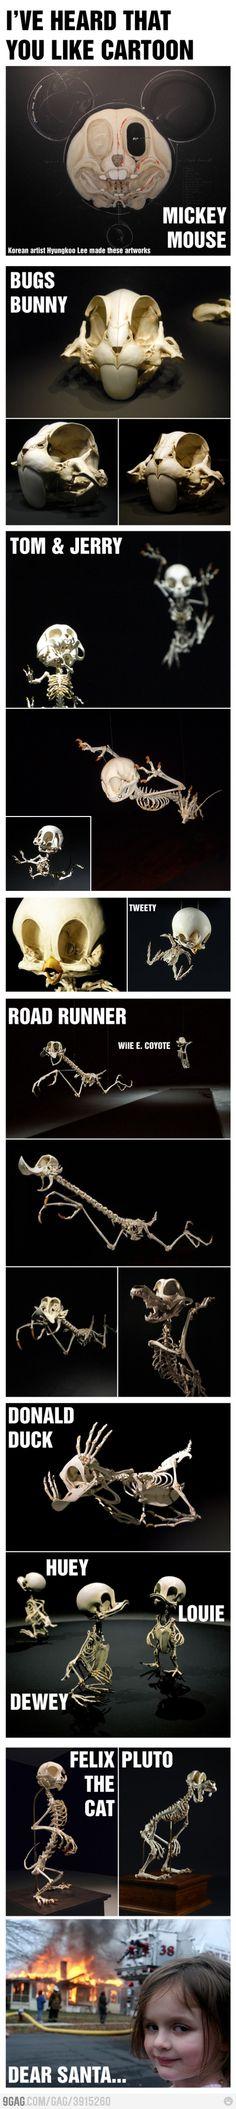 Some skeletons #Cartoon